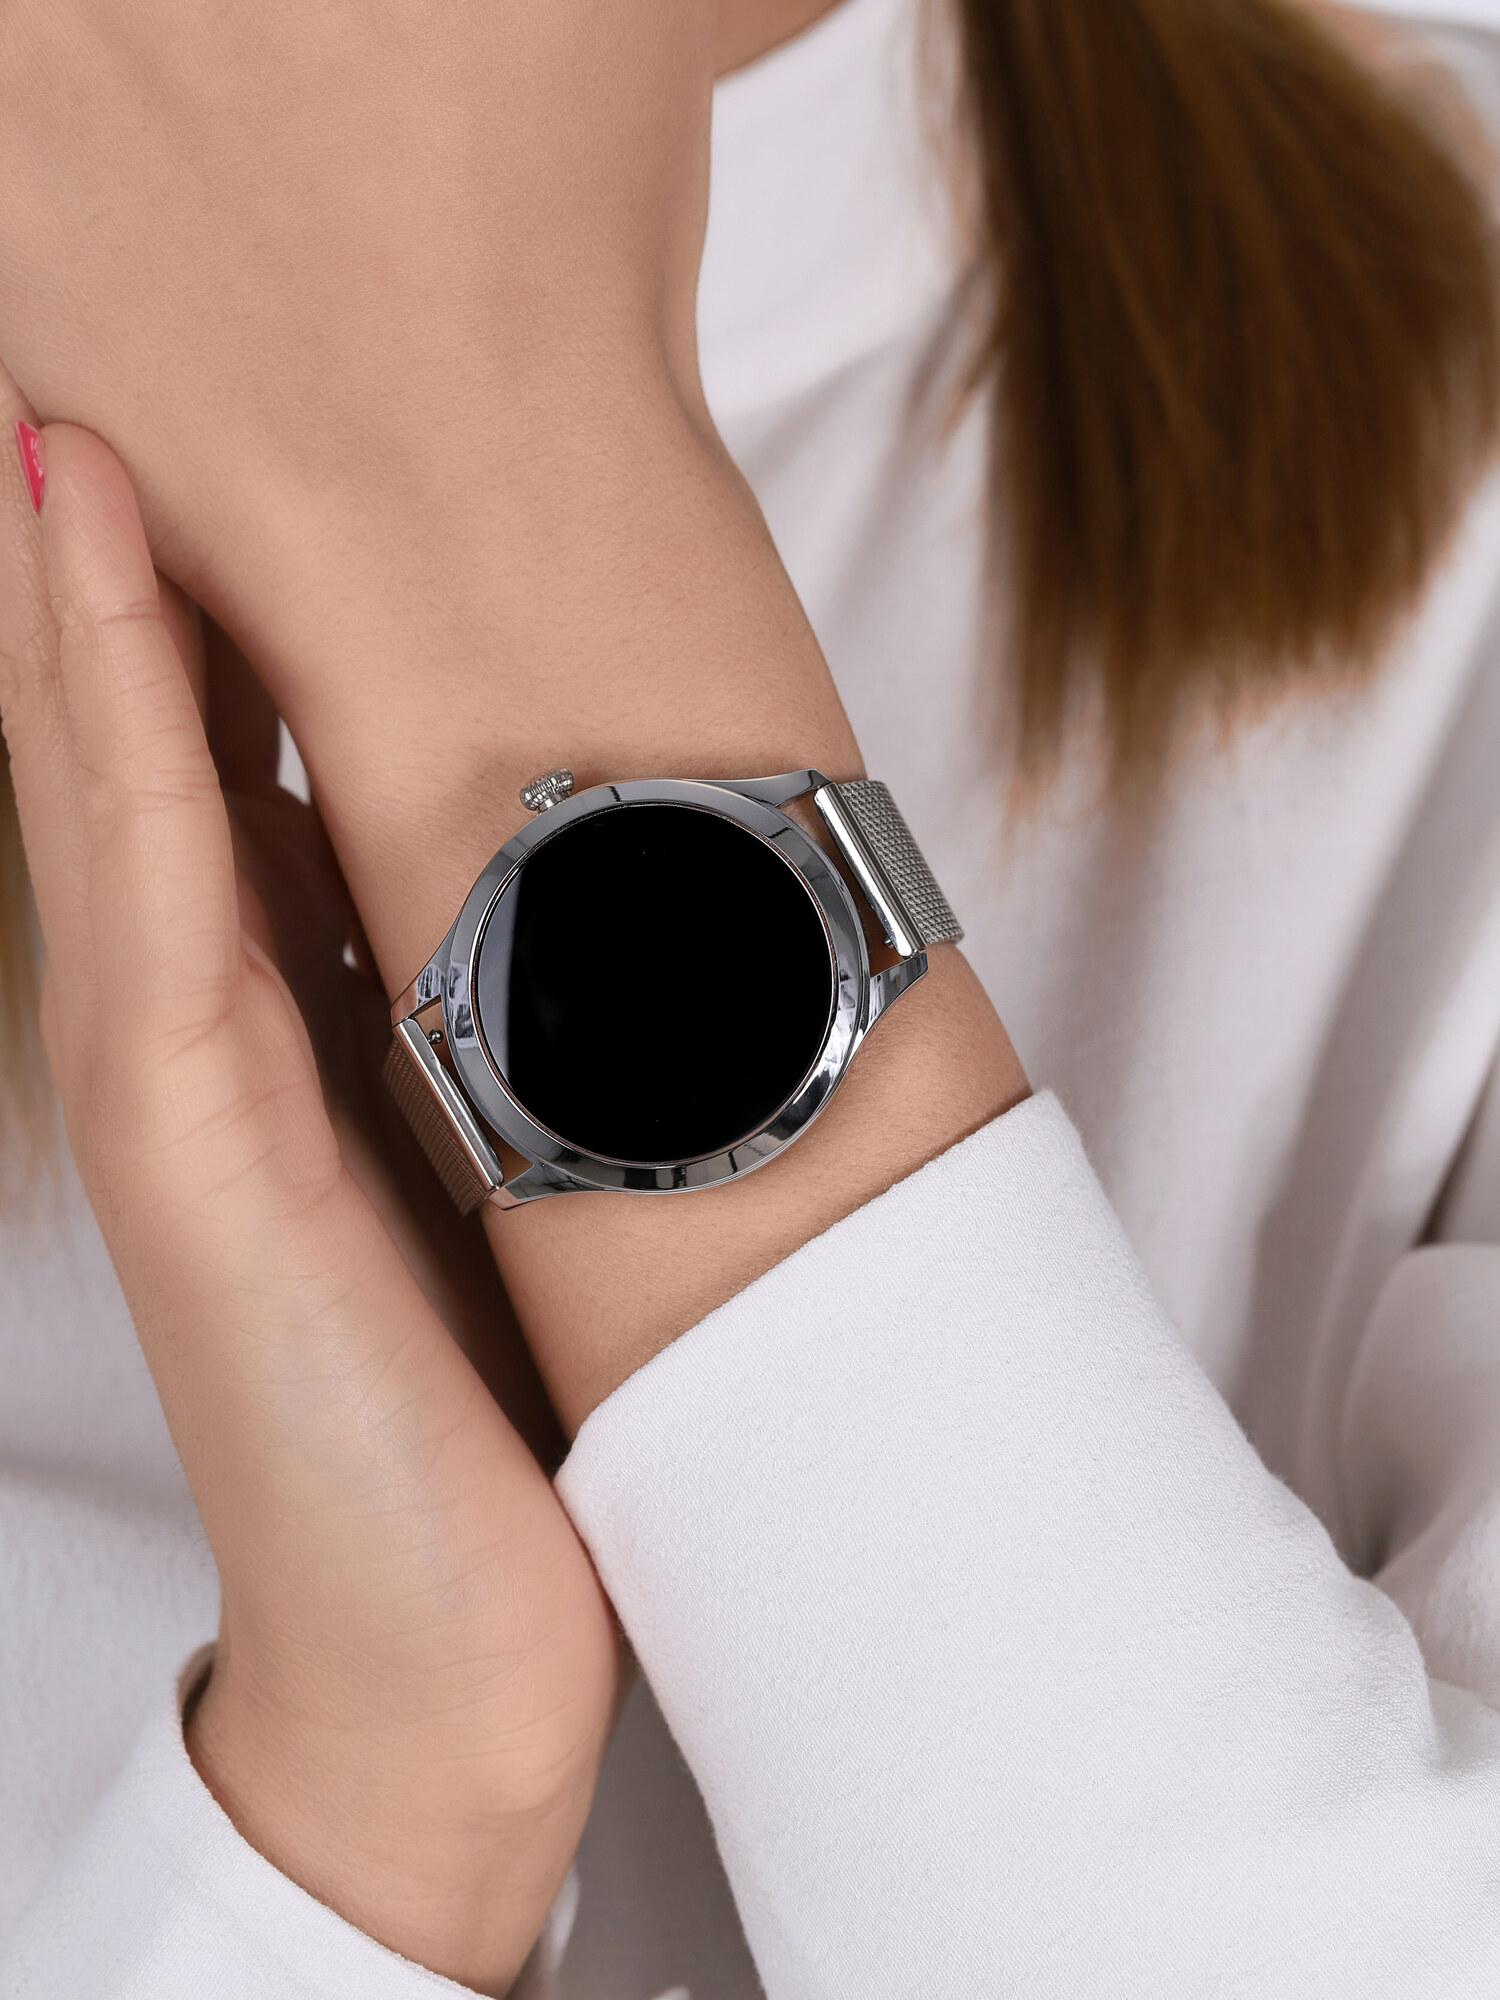 Marea B59005/3 B59005/3 Smartwatch + pasek zegarek sportowy Smartwatch